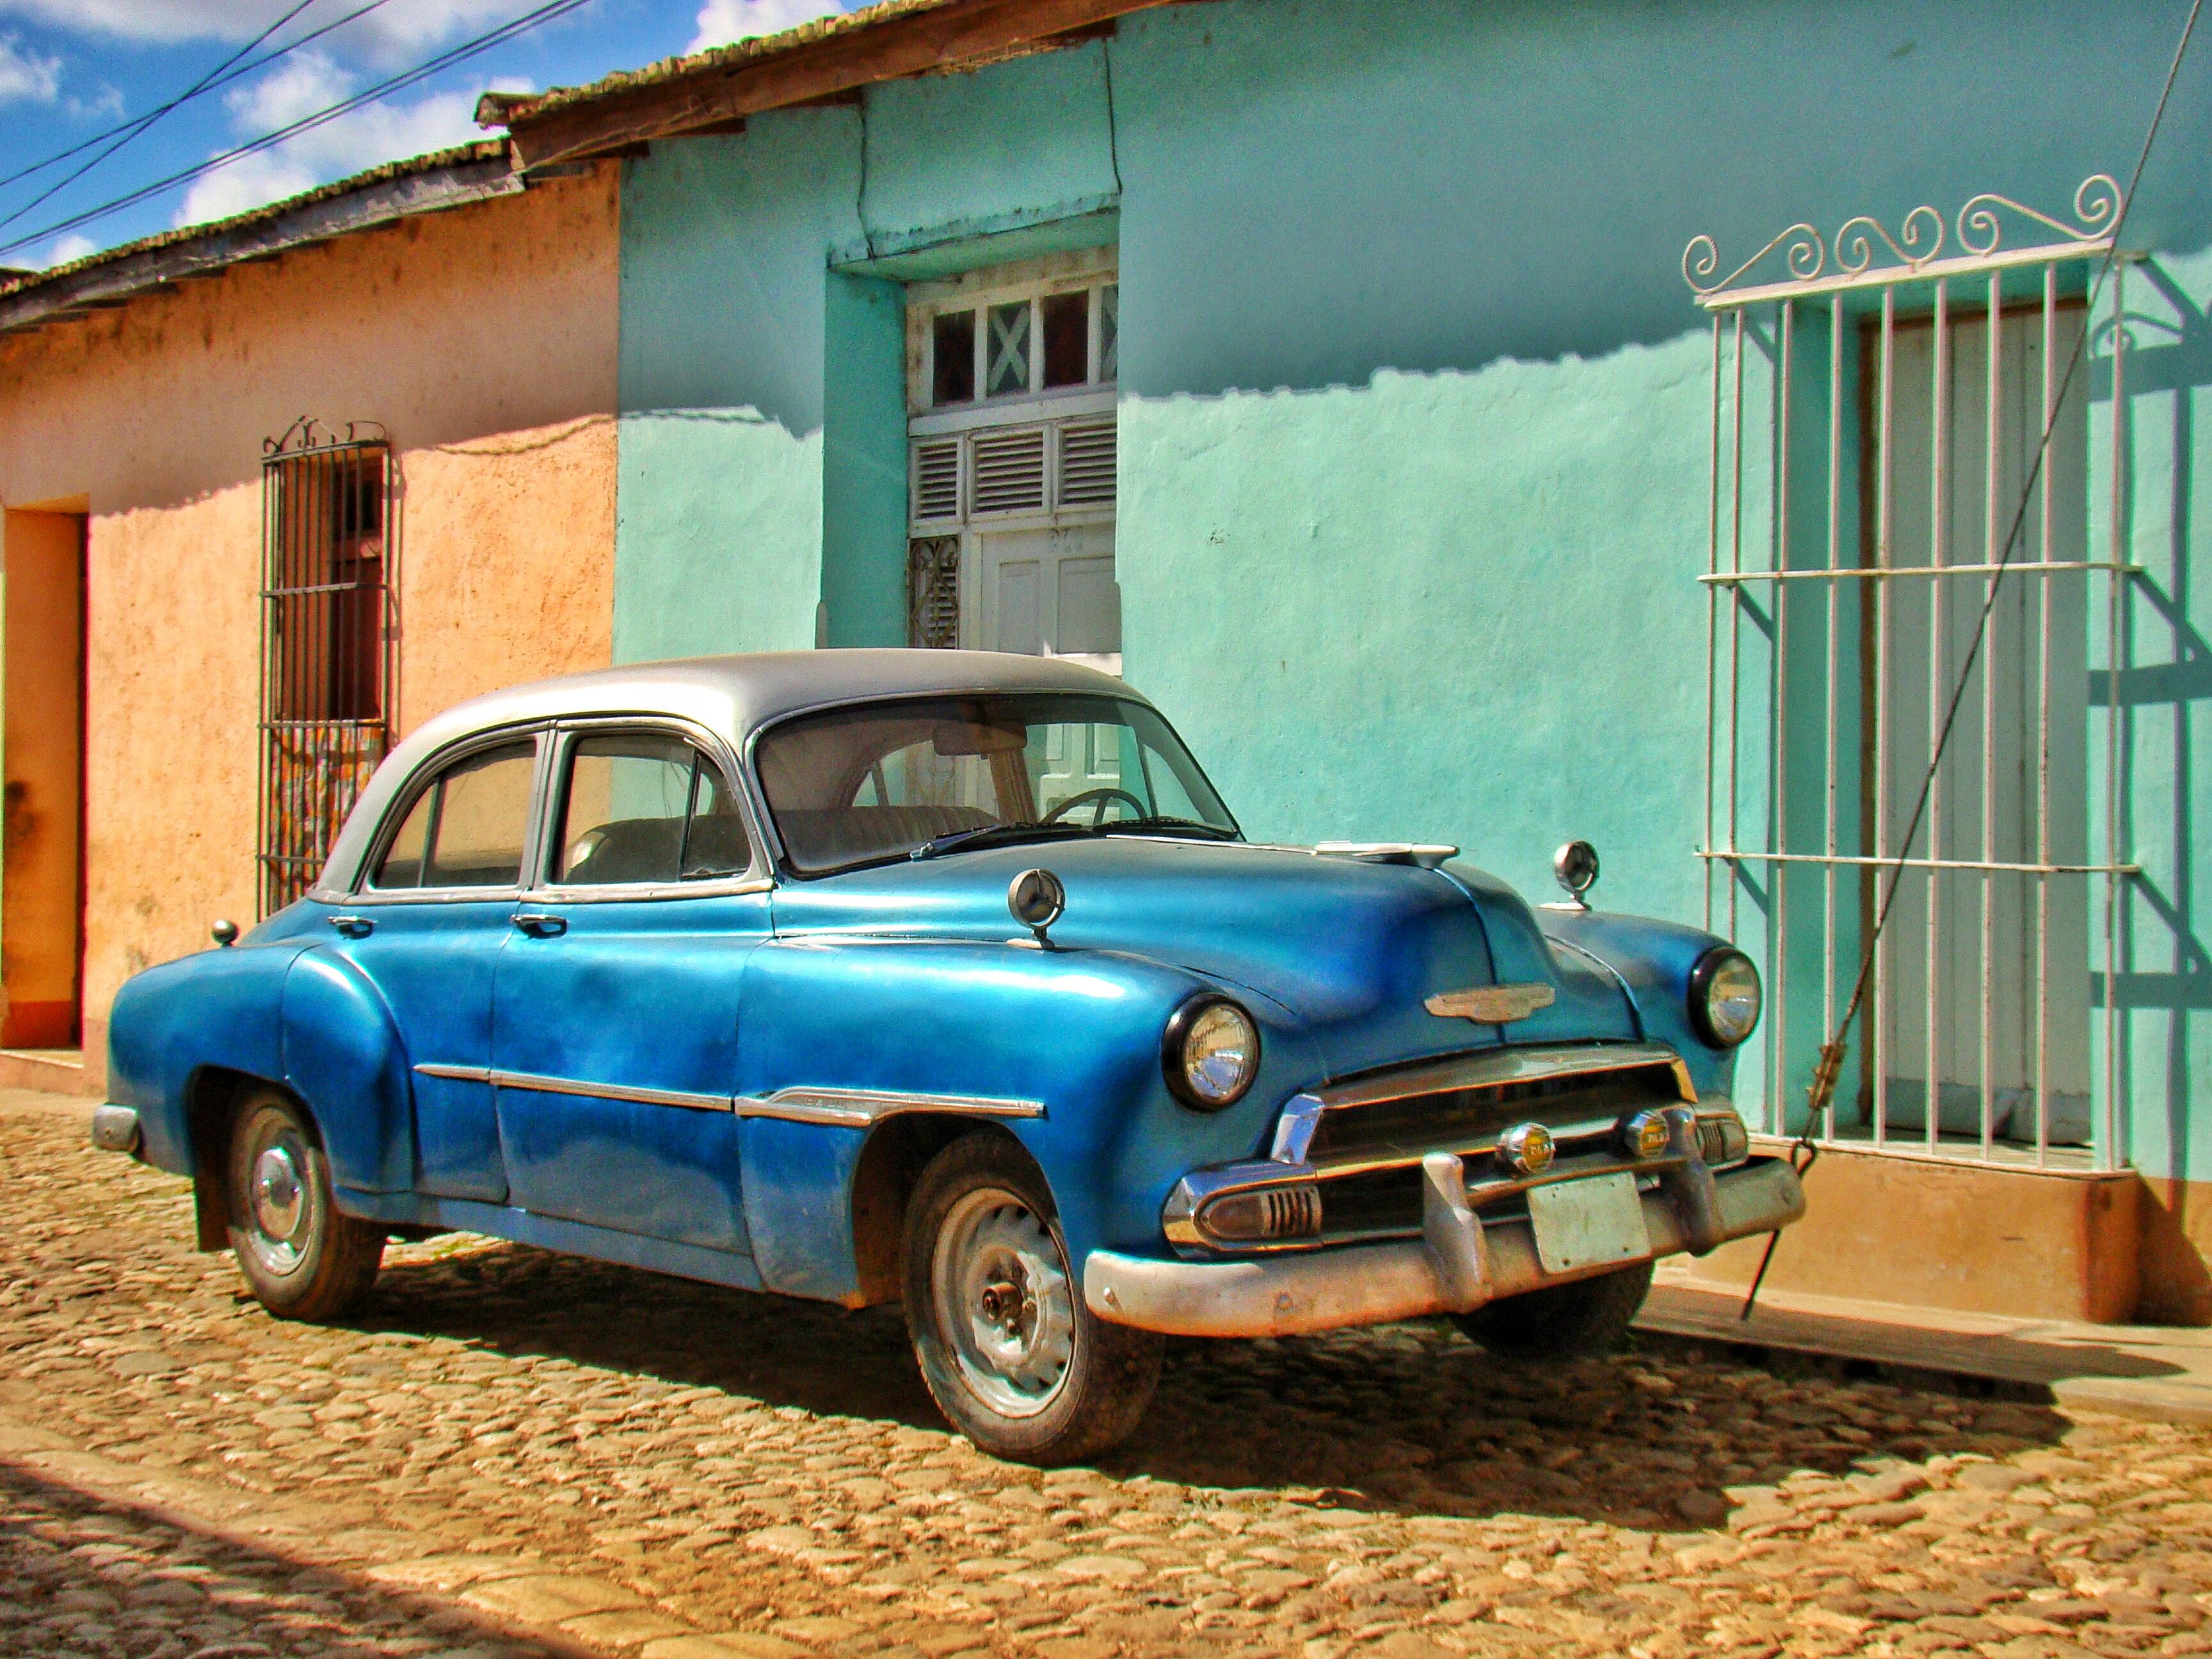 cuba trinidad cars classic cuban spot trip worldwanderista